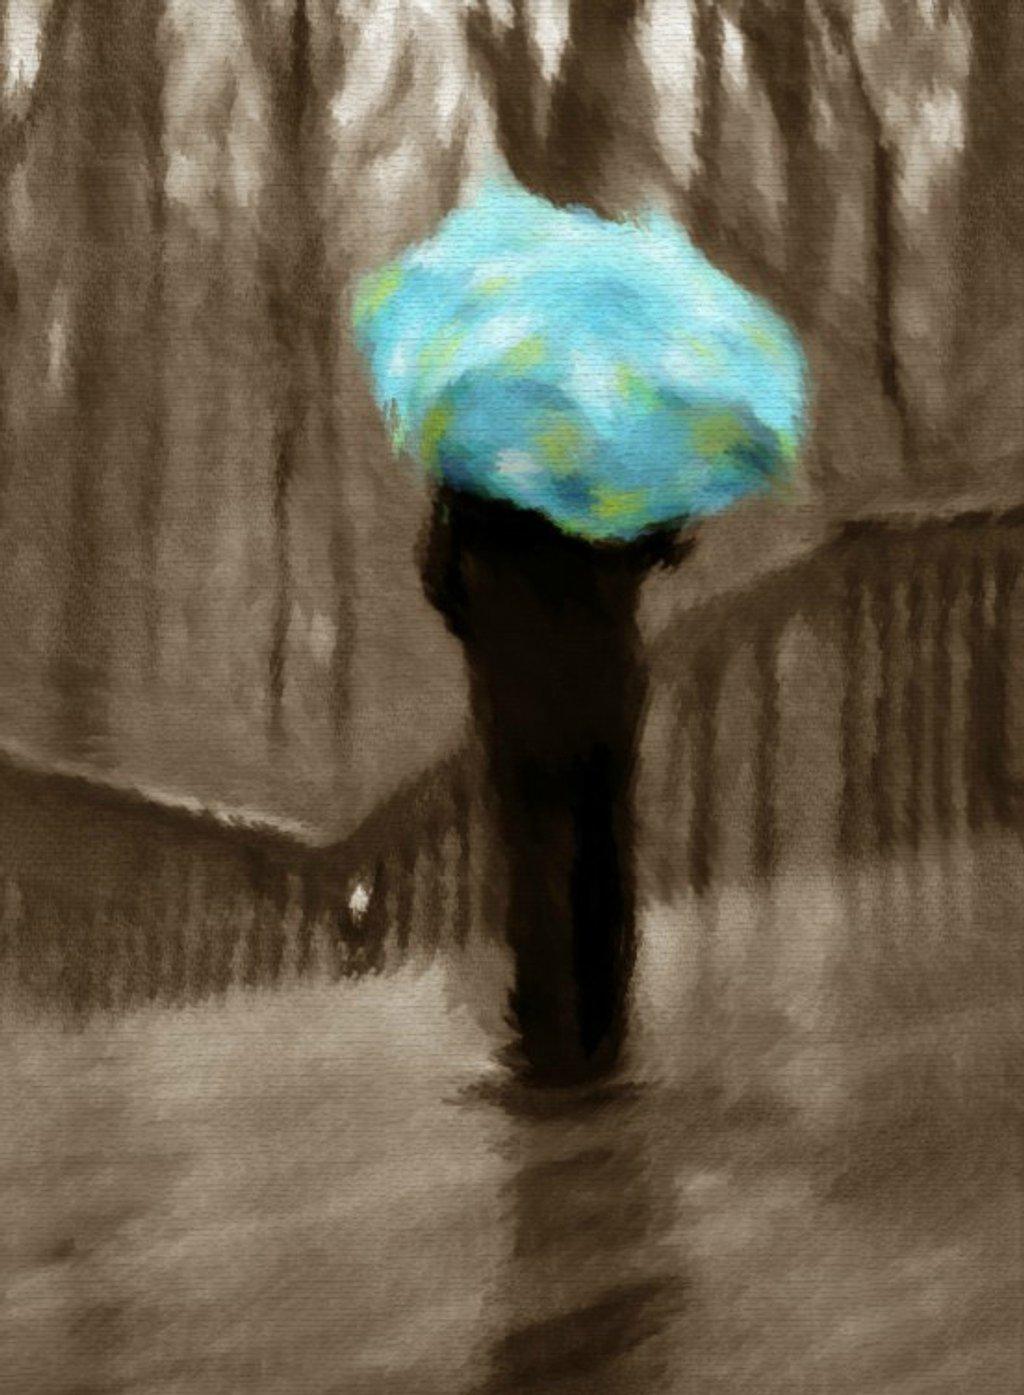 Rainy Day Wintertime Blues by alophoto